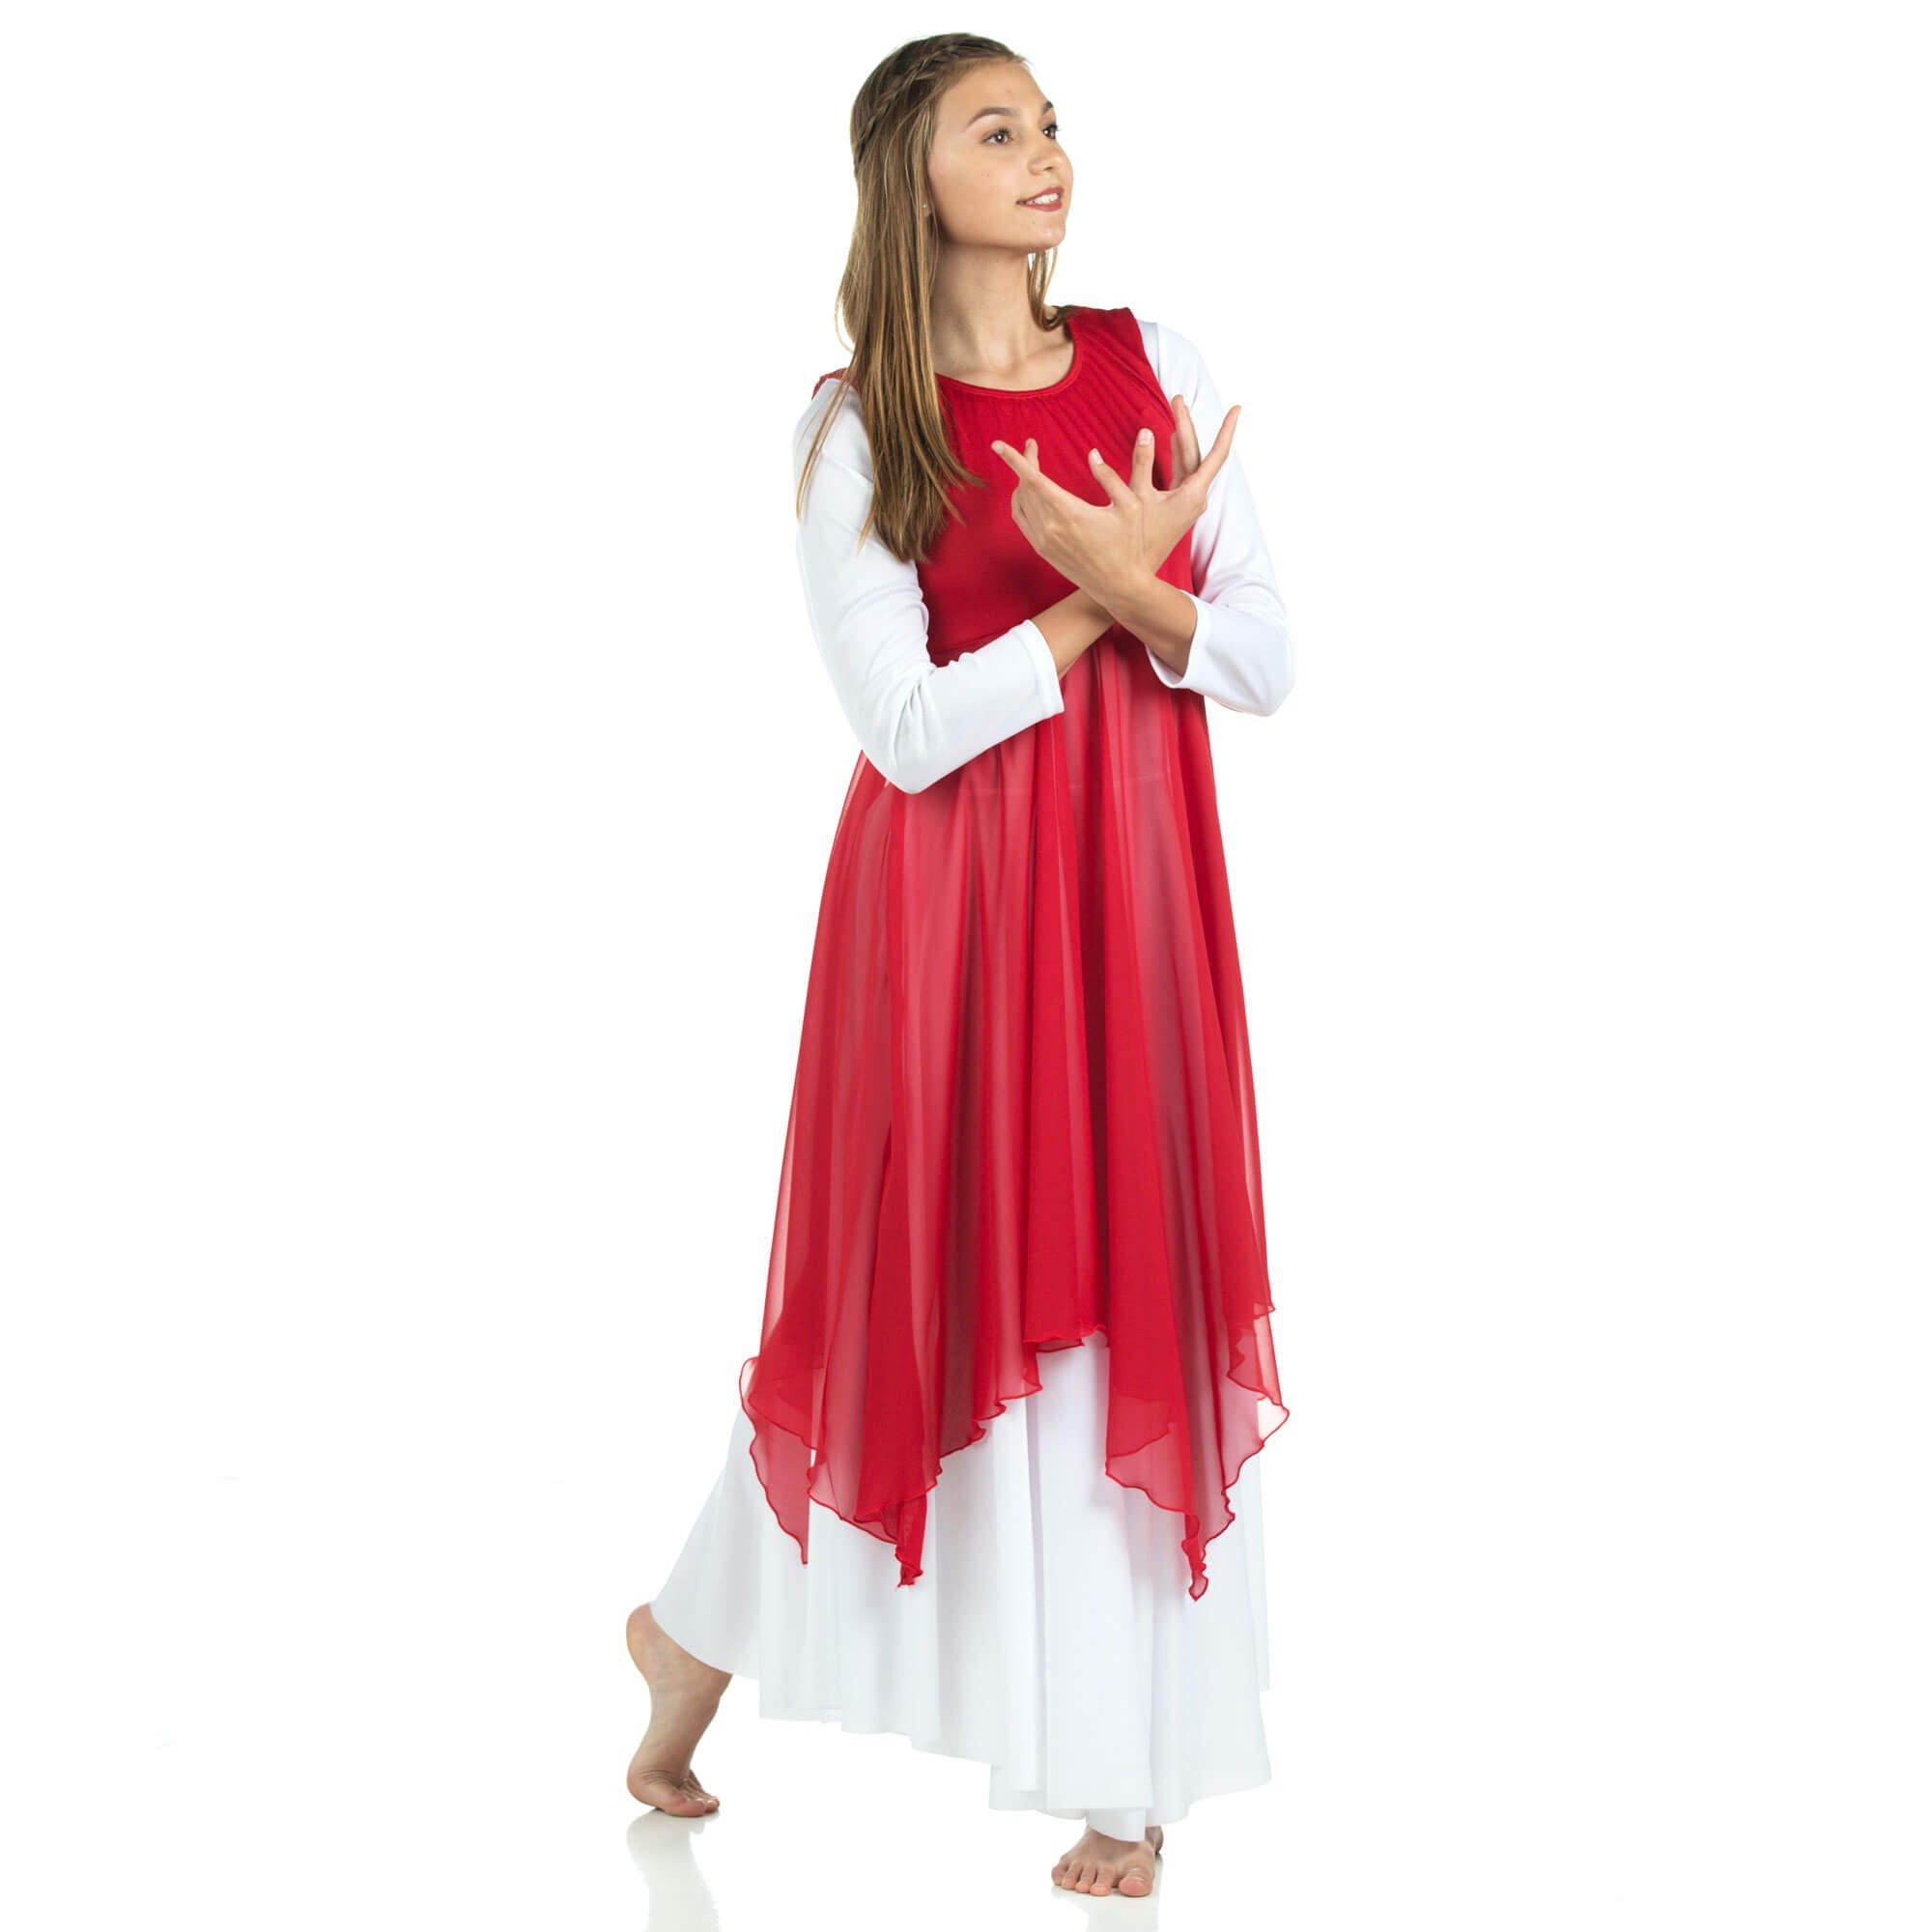 worship dancewear mime costume church dresses praise dance